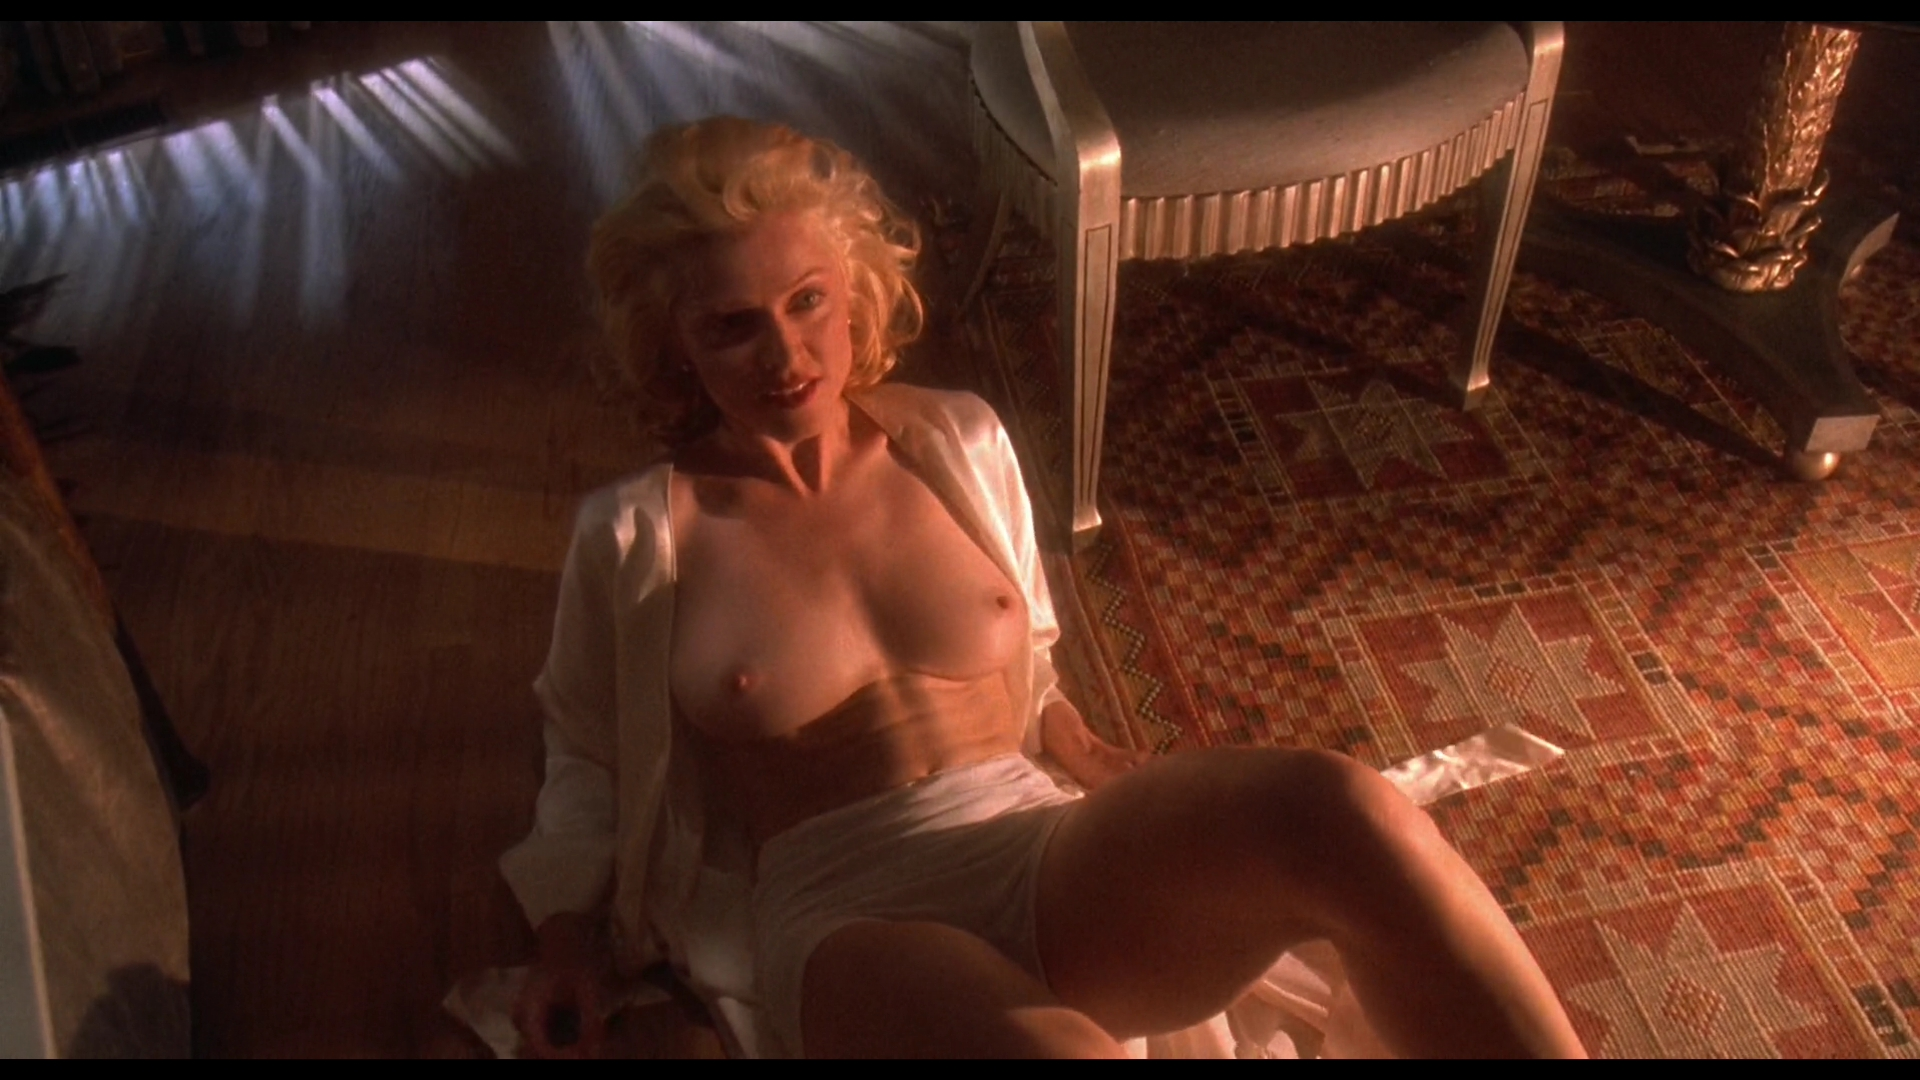 Hot nude film porn movie